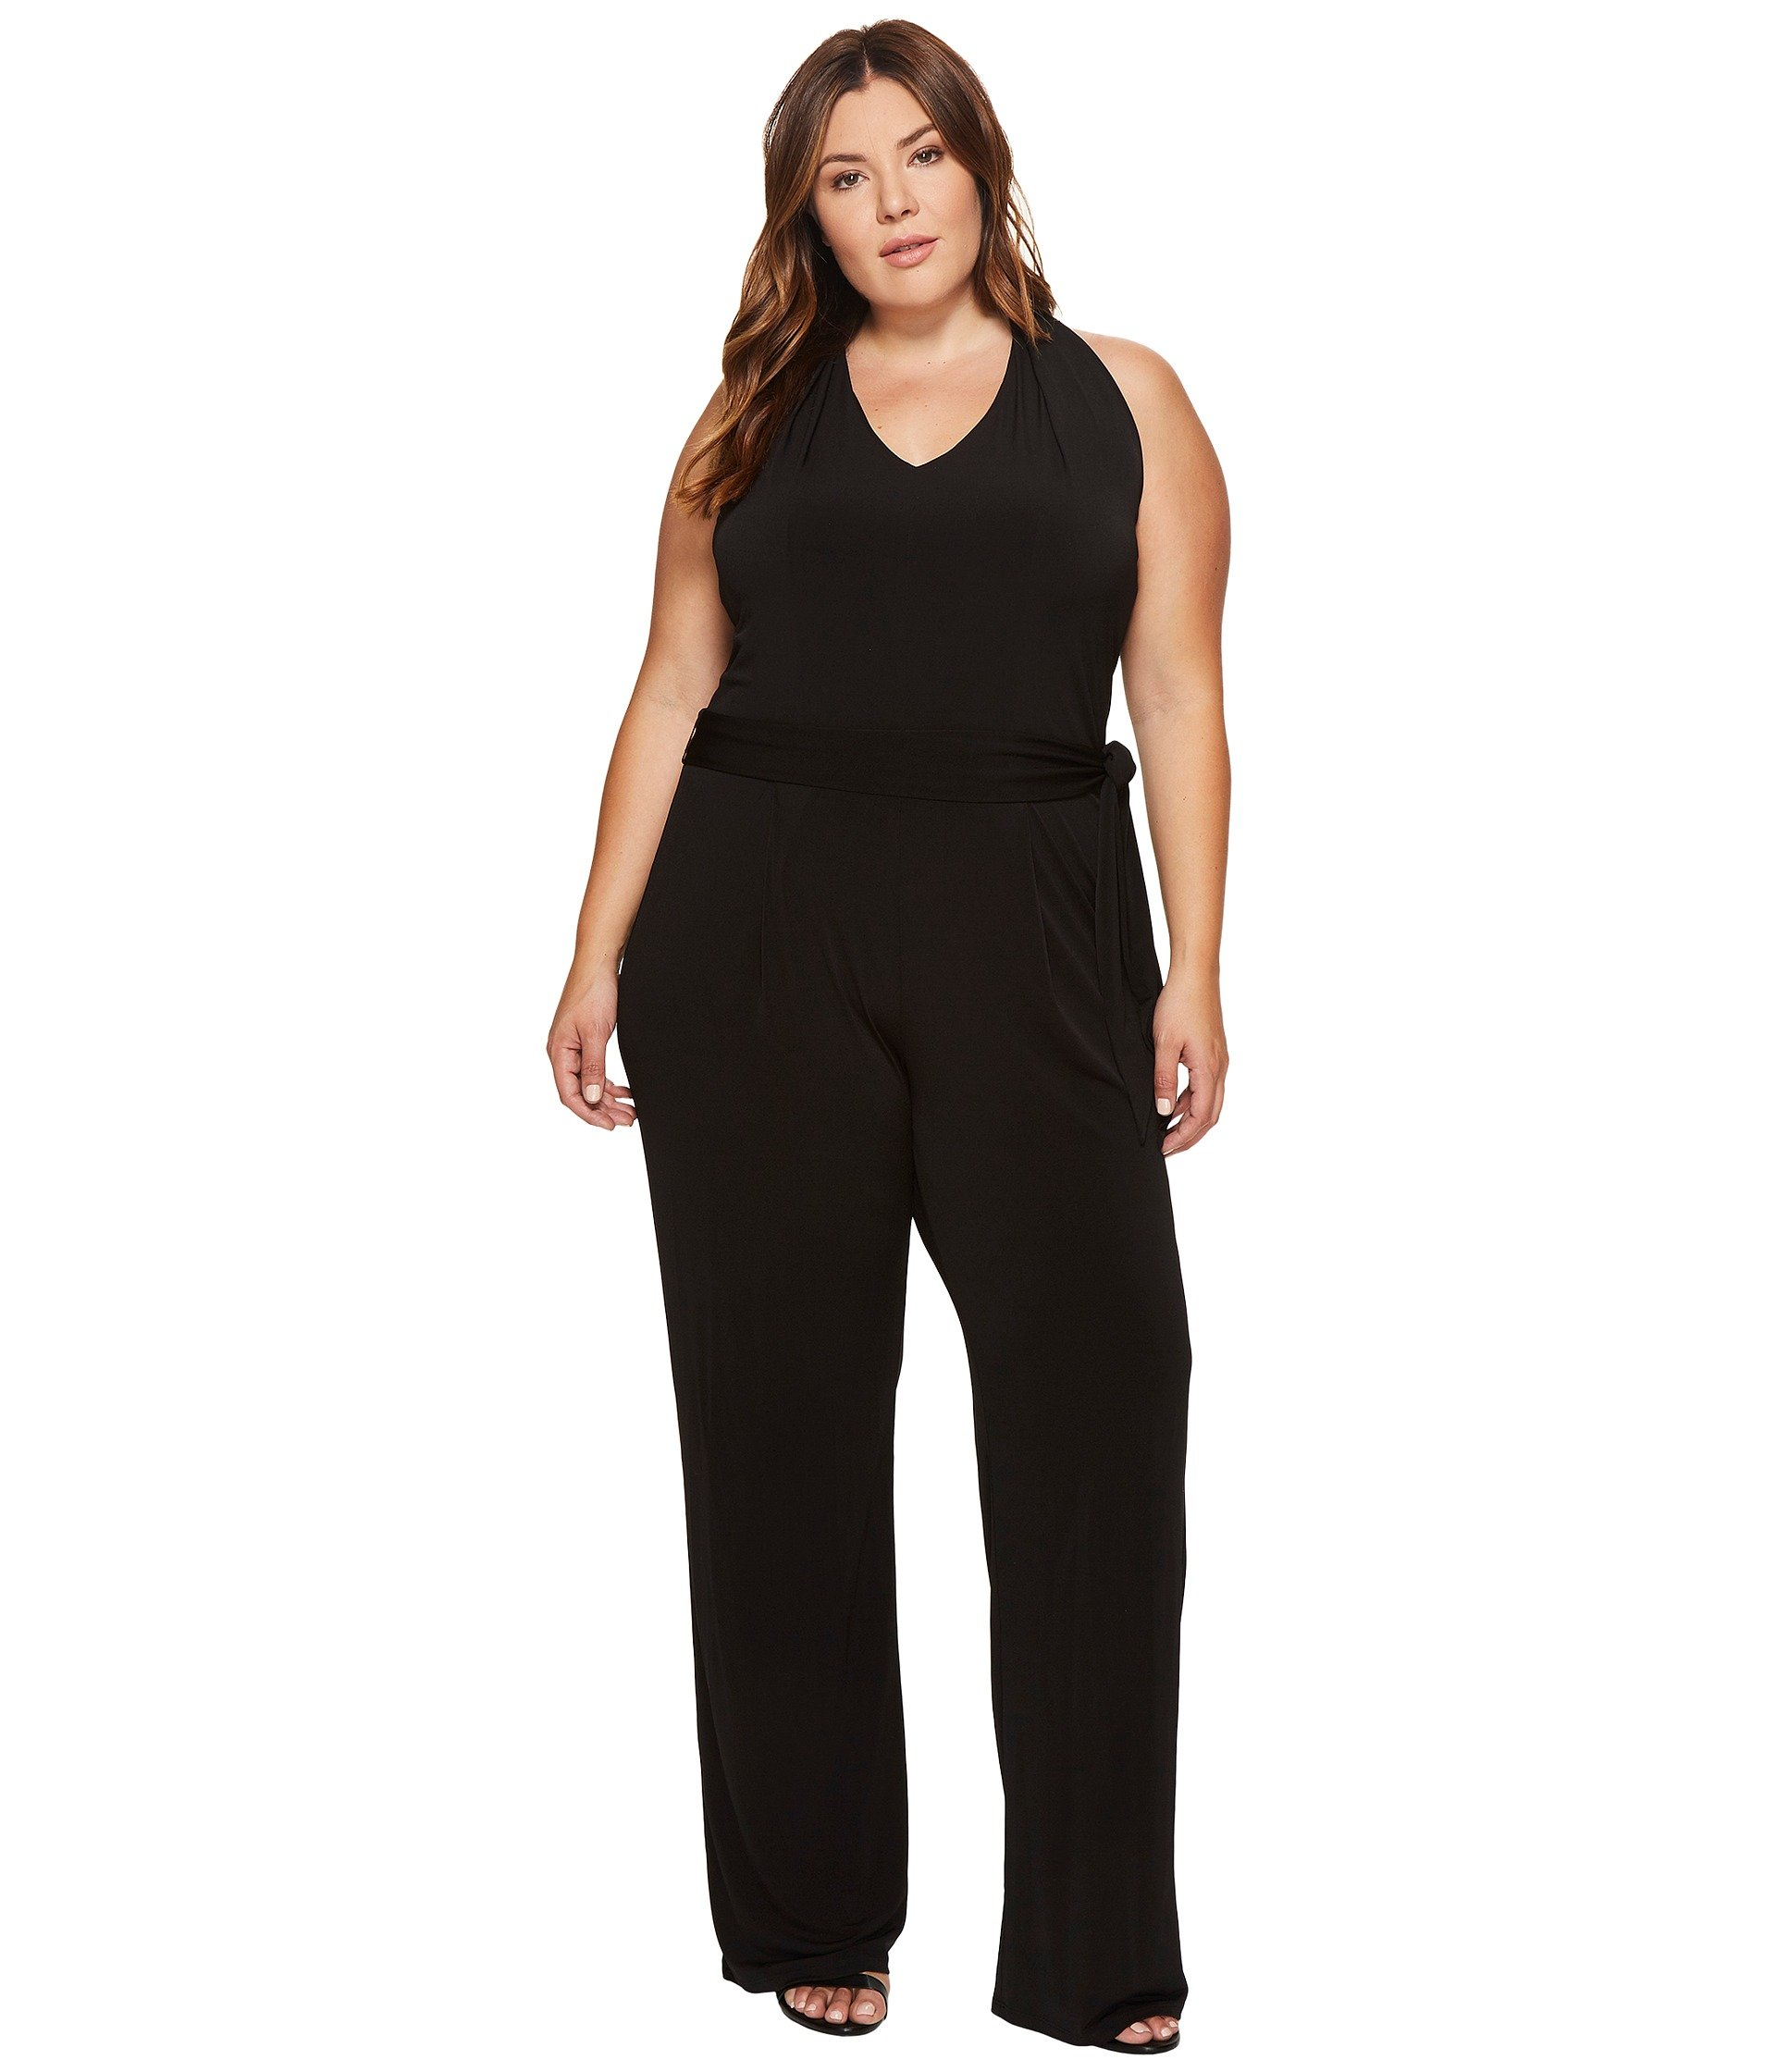 Michael Michael Kors Womens Plus Wide-Leg Sleeveless Jumpsuit Black 2X